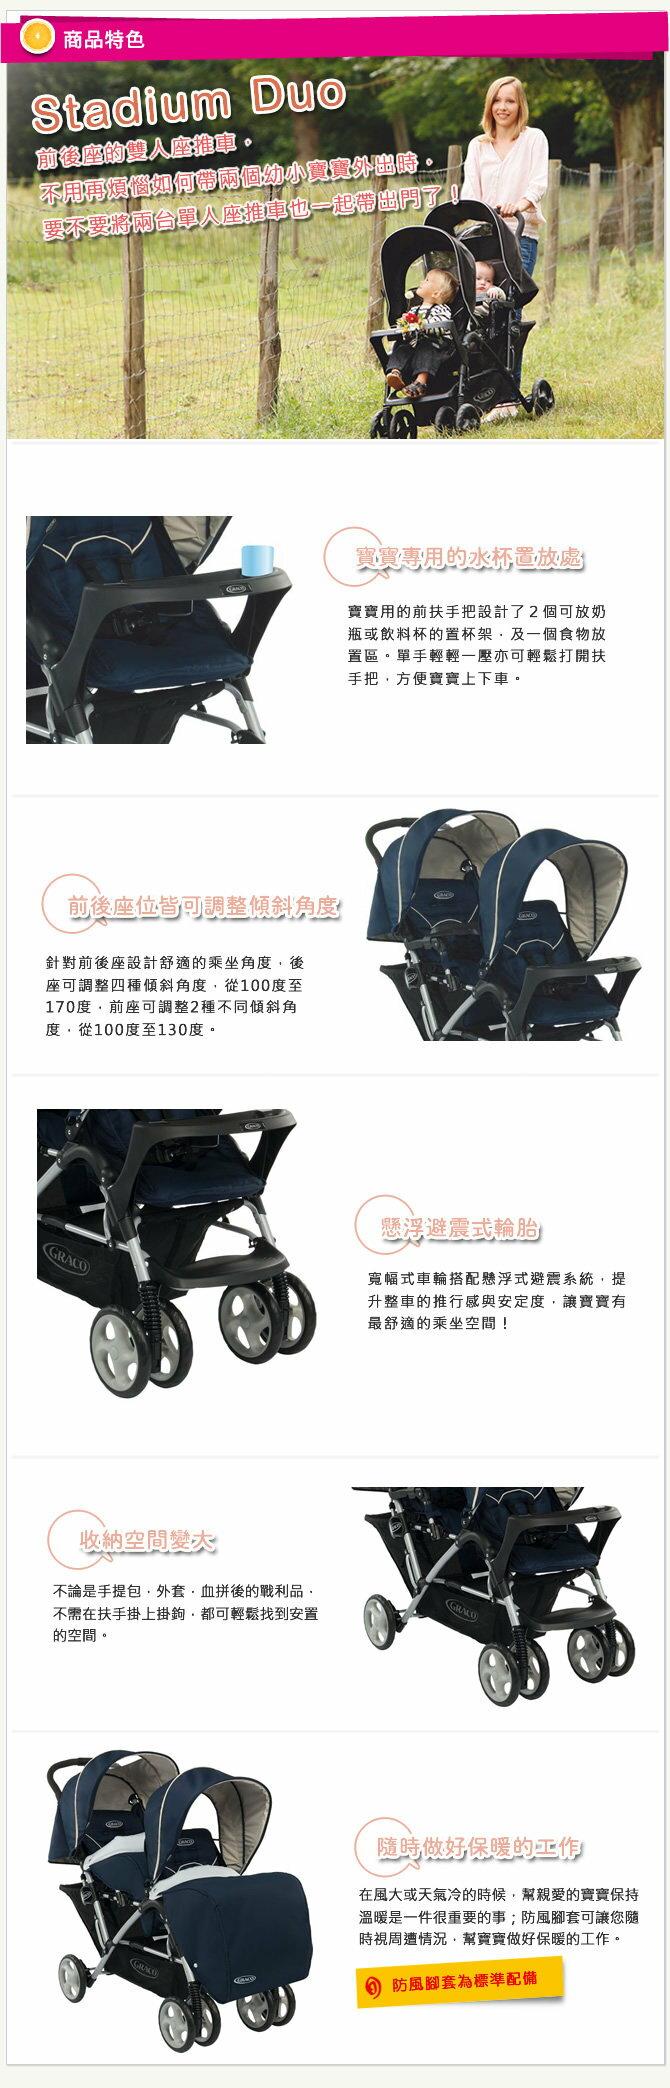 Graco - Stadium Duo 雙人前後座嬰幼兒手推車 城市雙人行 -天海藍 1